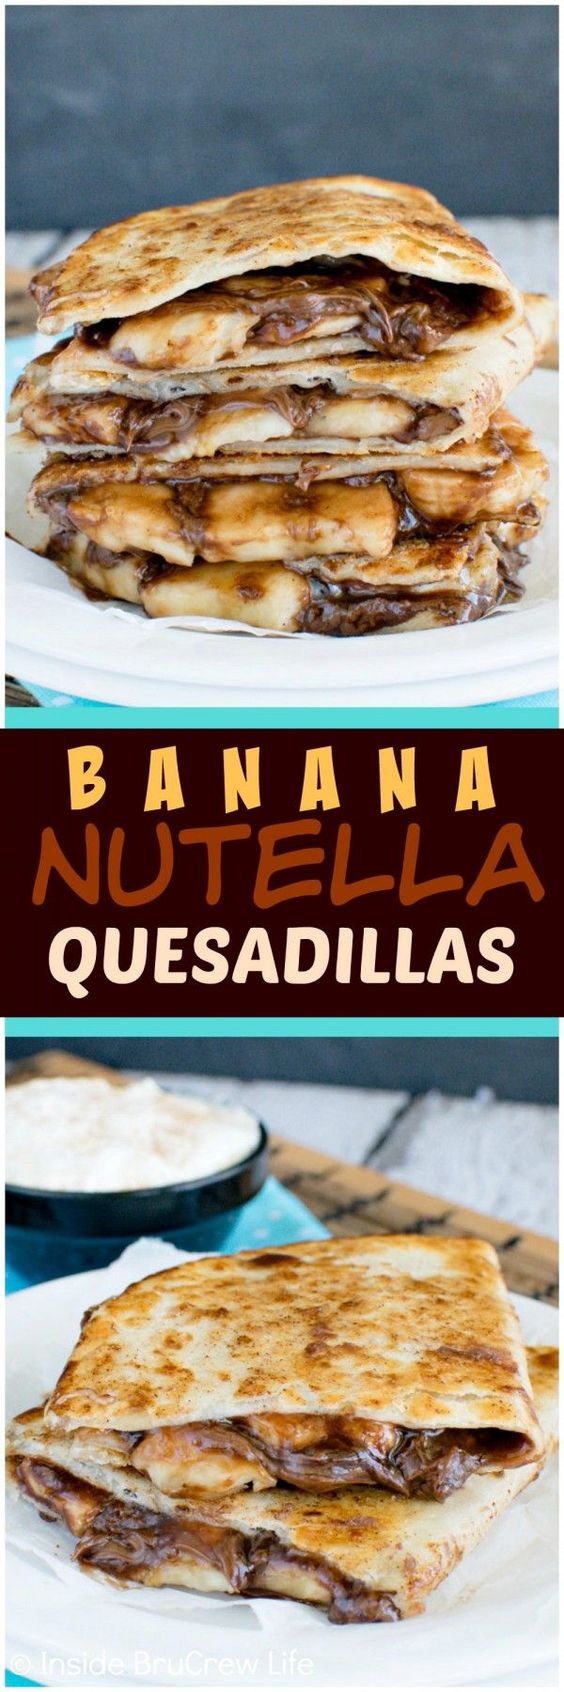 Banana Nutella Quesadillas - cinnamon sugar tortillas filled with banana slices…